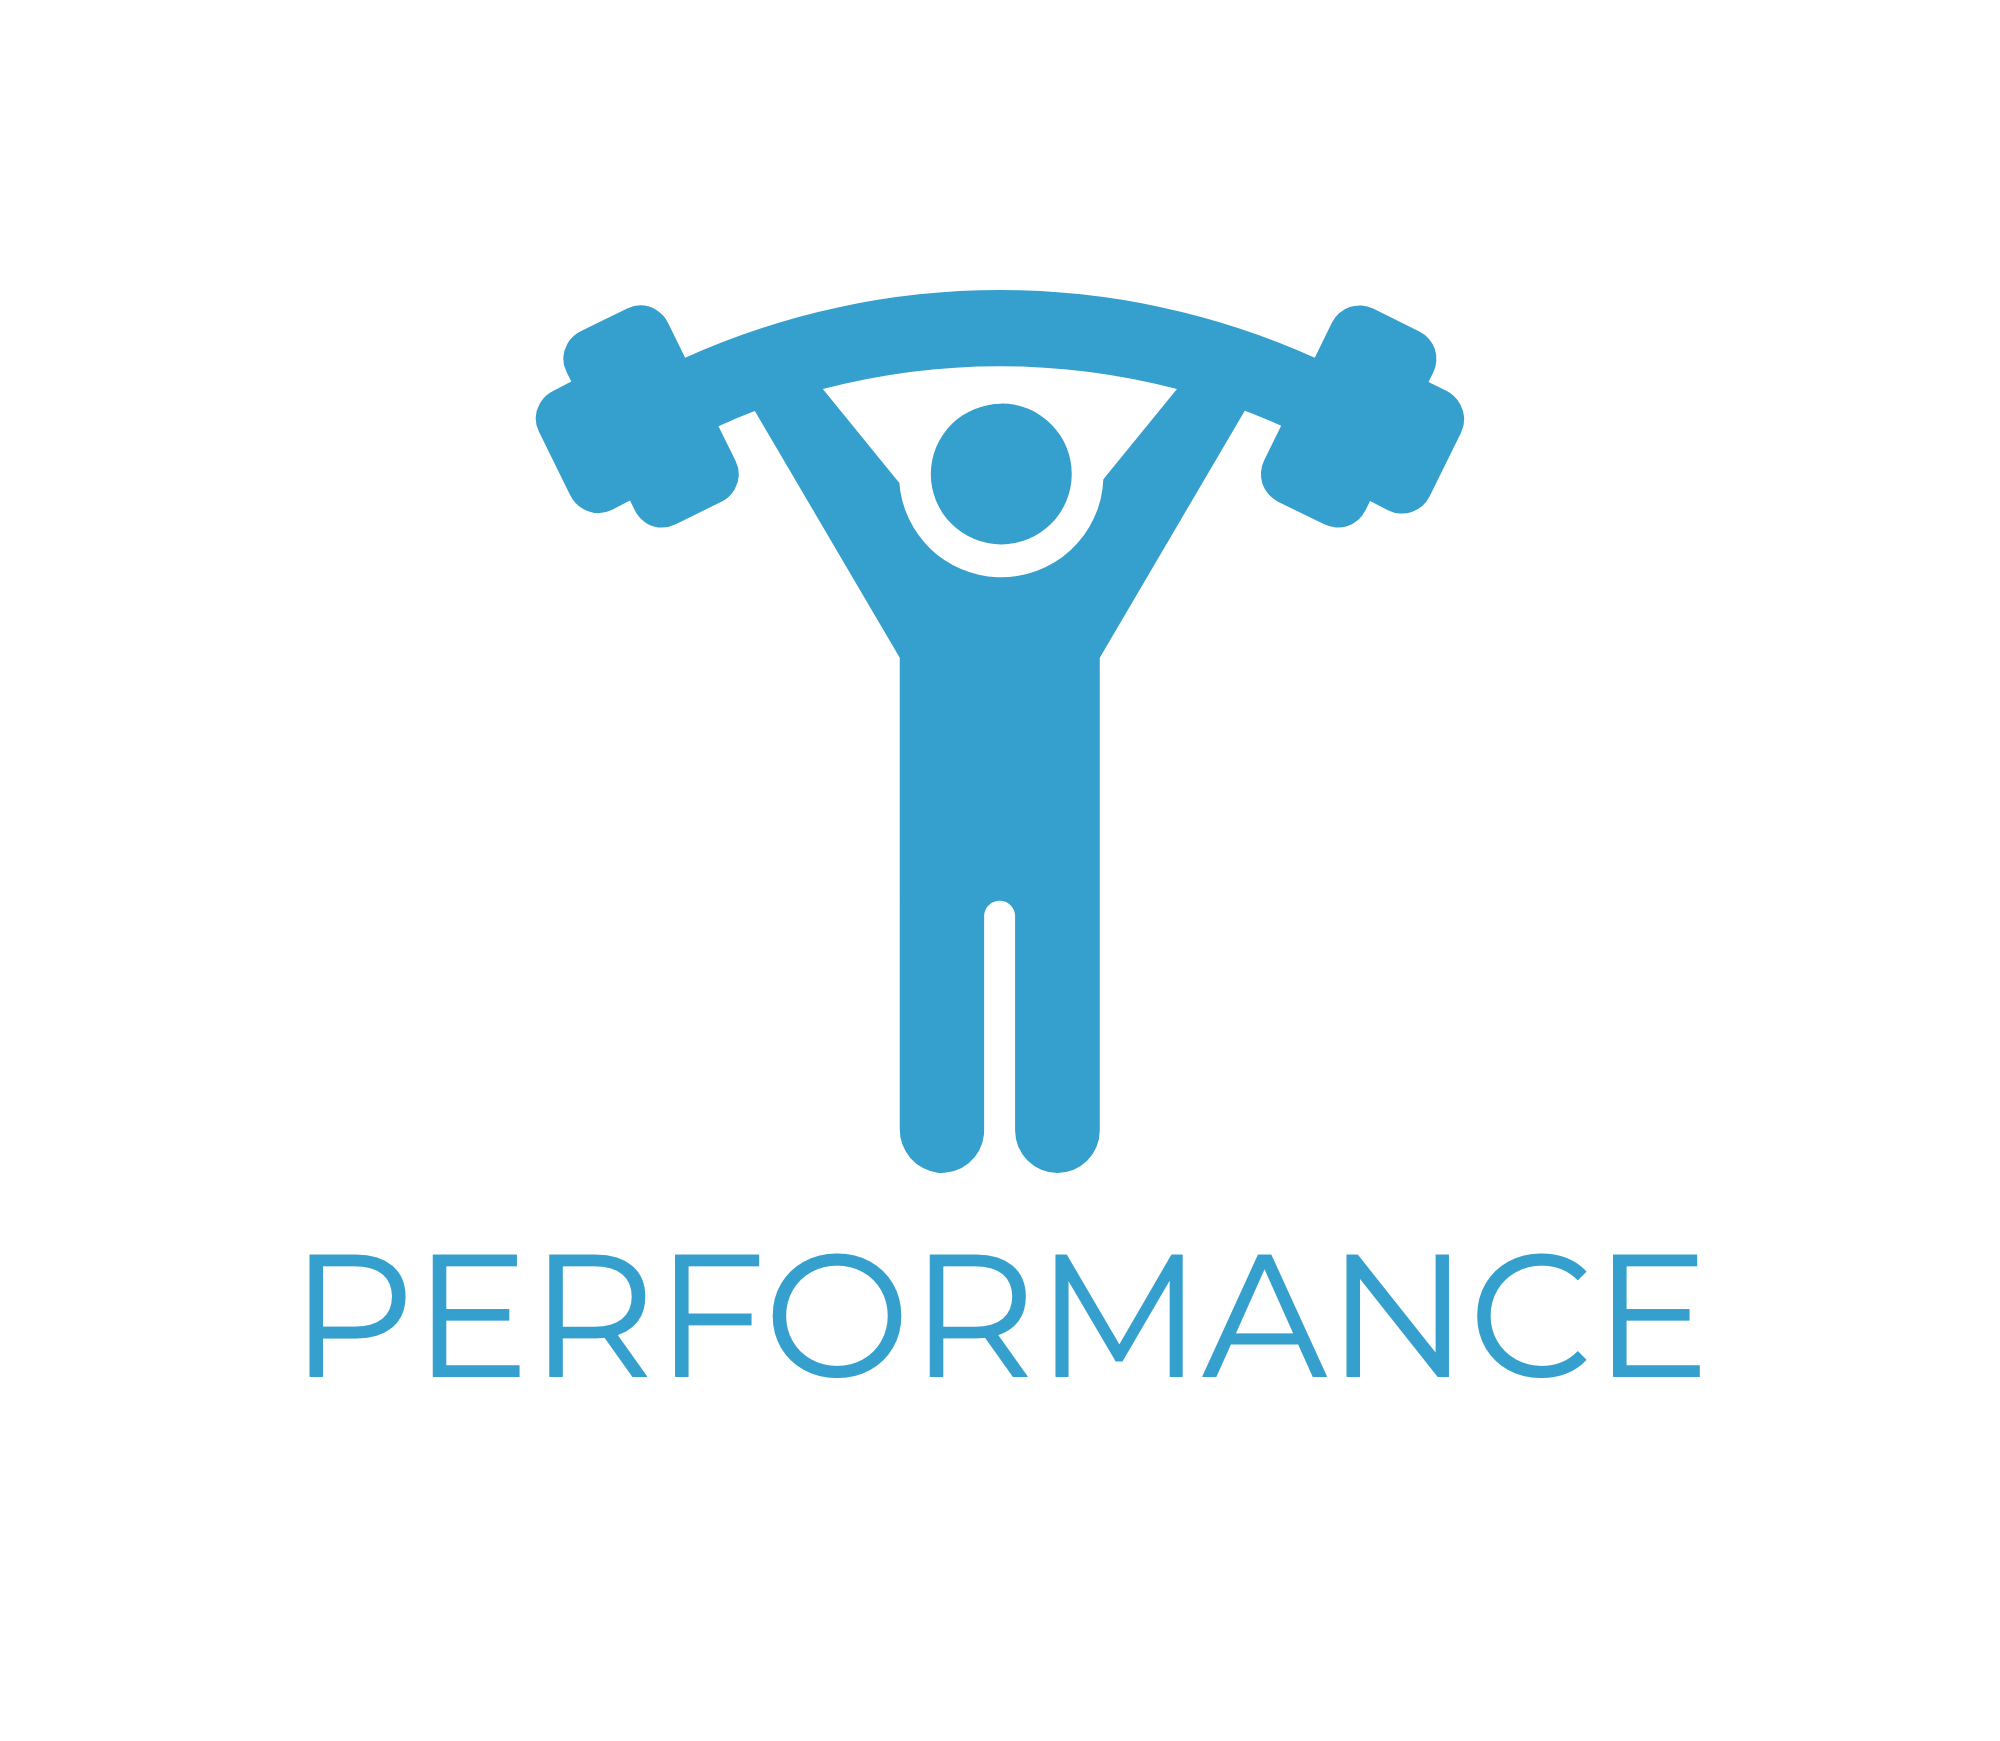 performancelogo.png